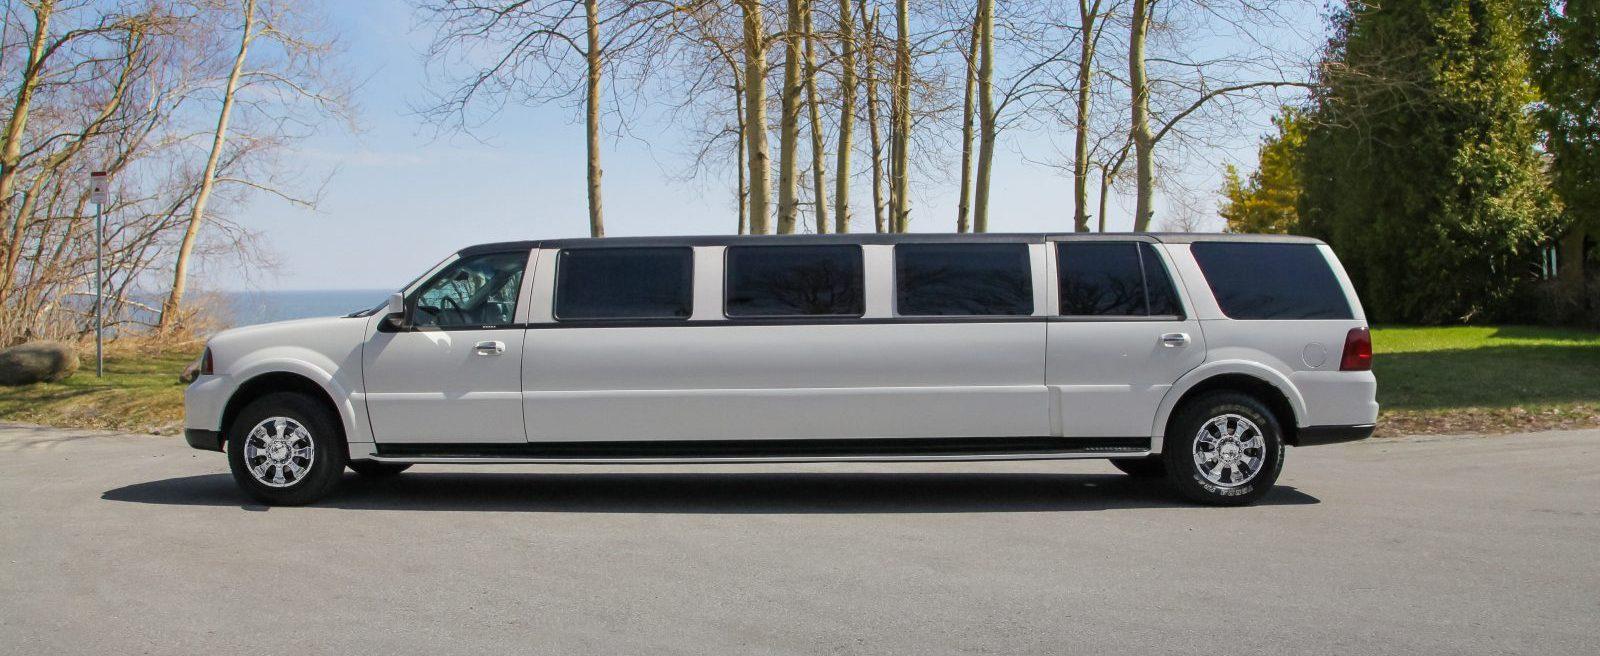 White Stretch SUV Lincoln Navigator